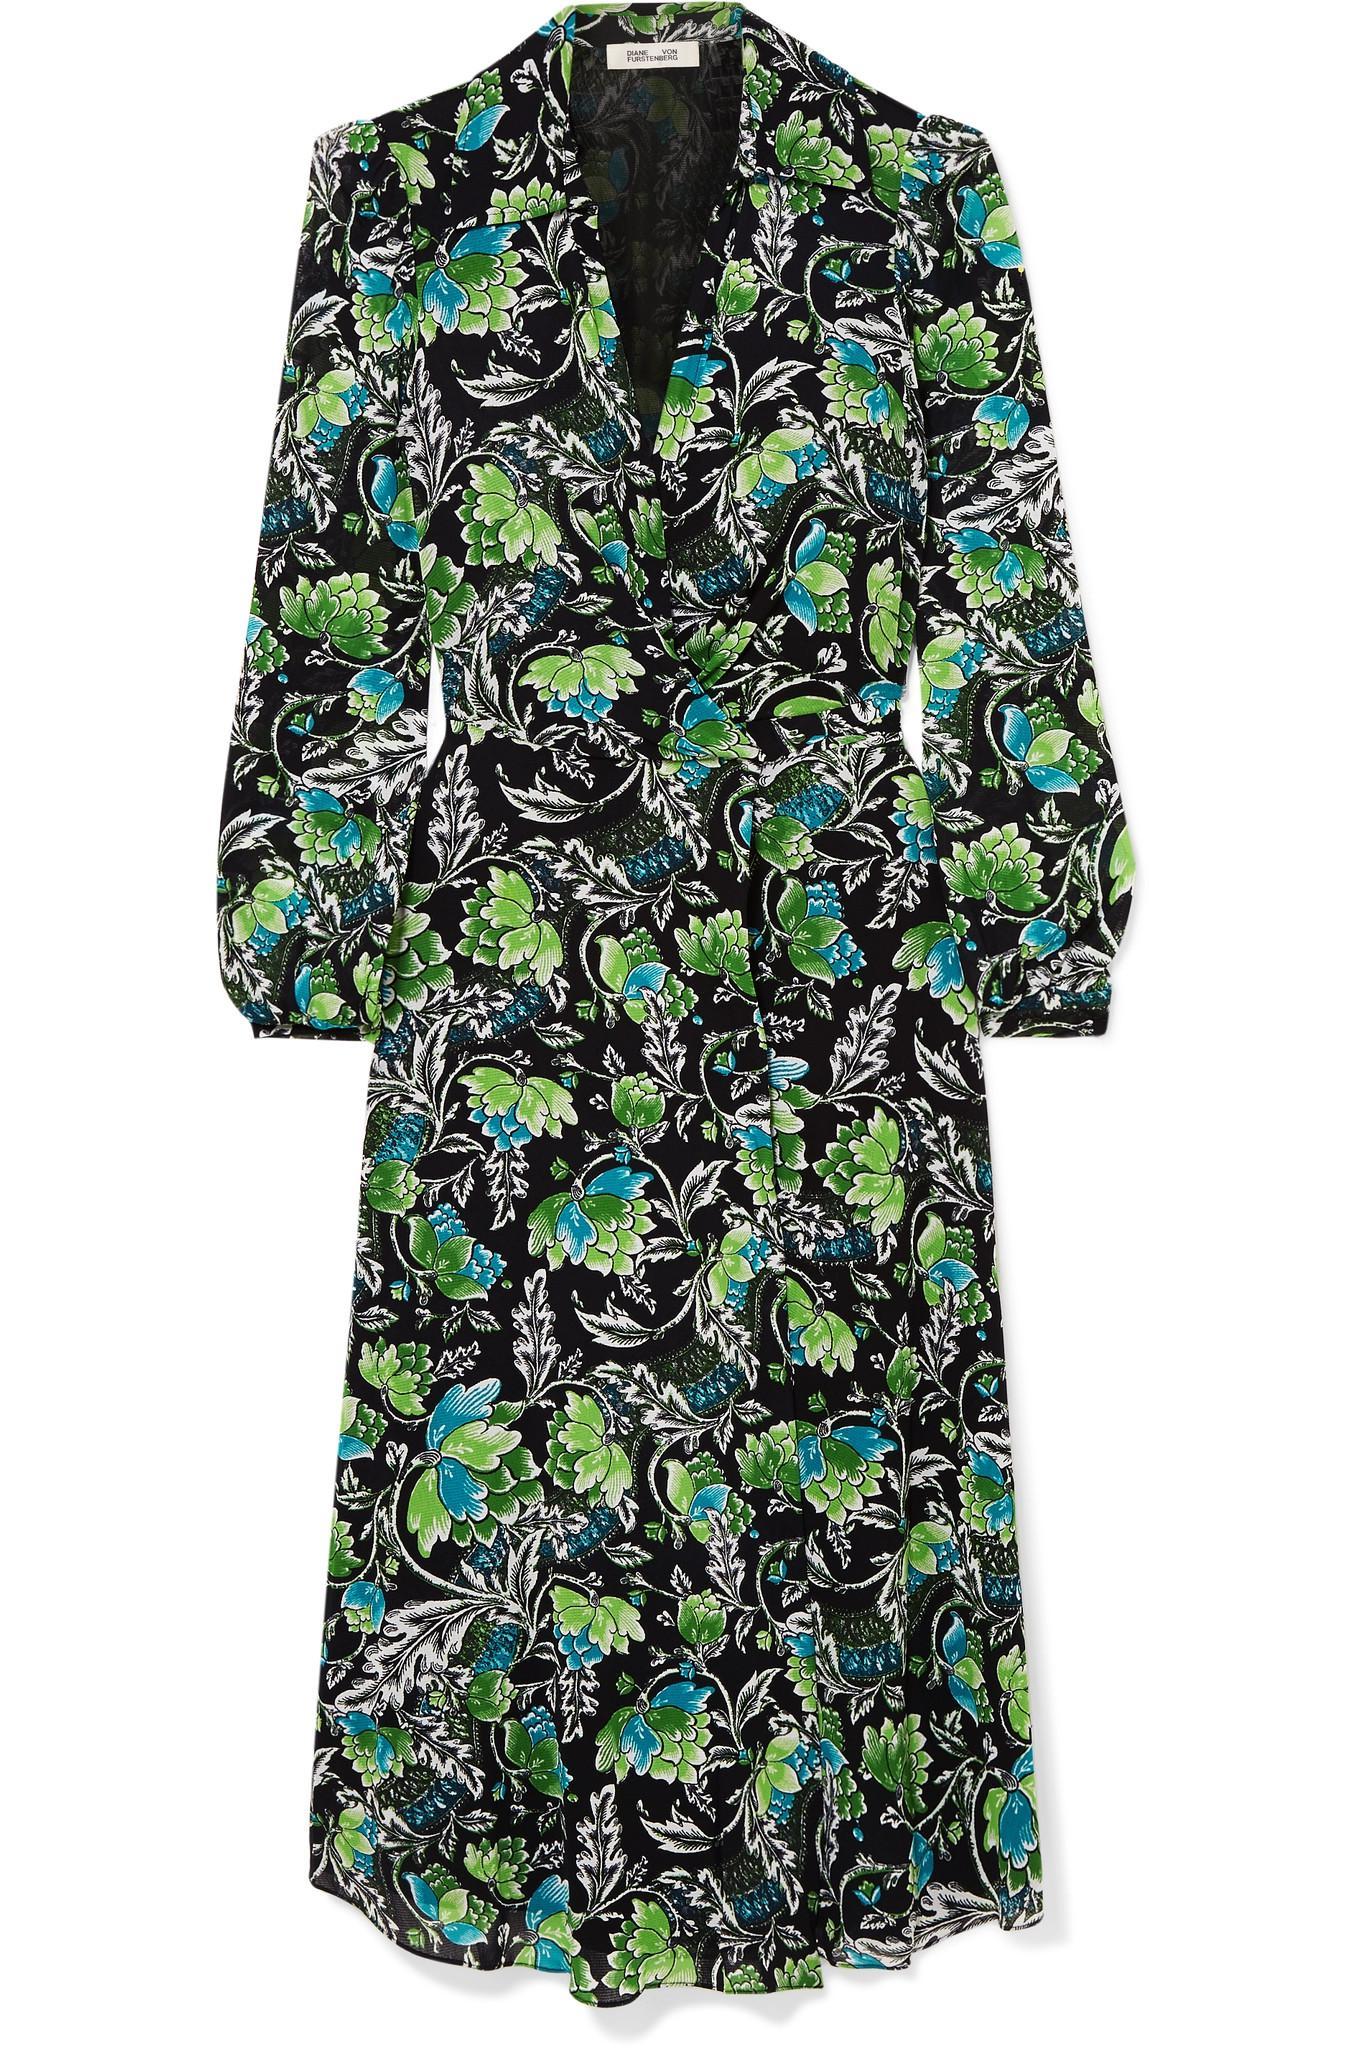 0e73c9f3c4 Diane von Furstenberg. Women s Green Phoenix Floral-print Georgette Wrap  Dress